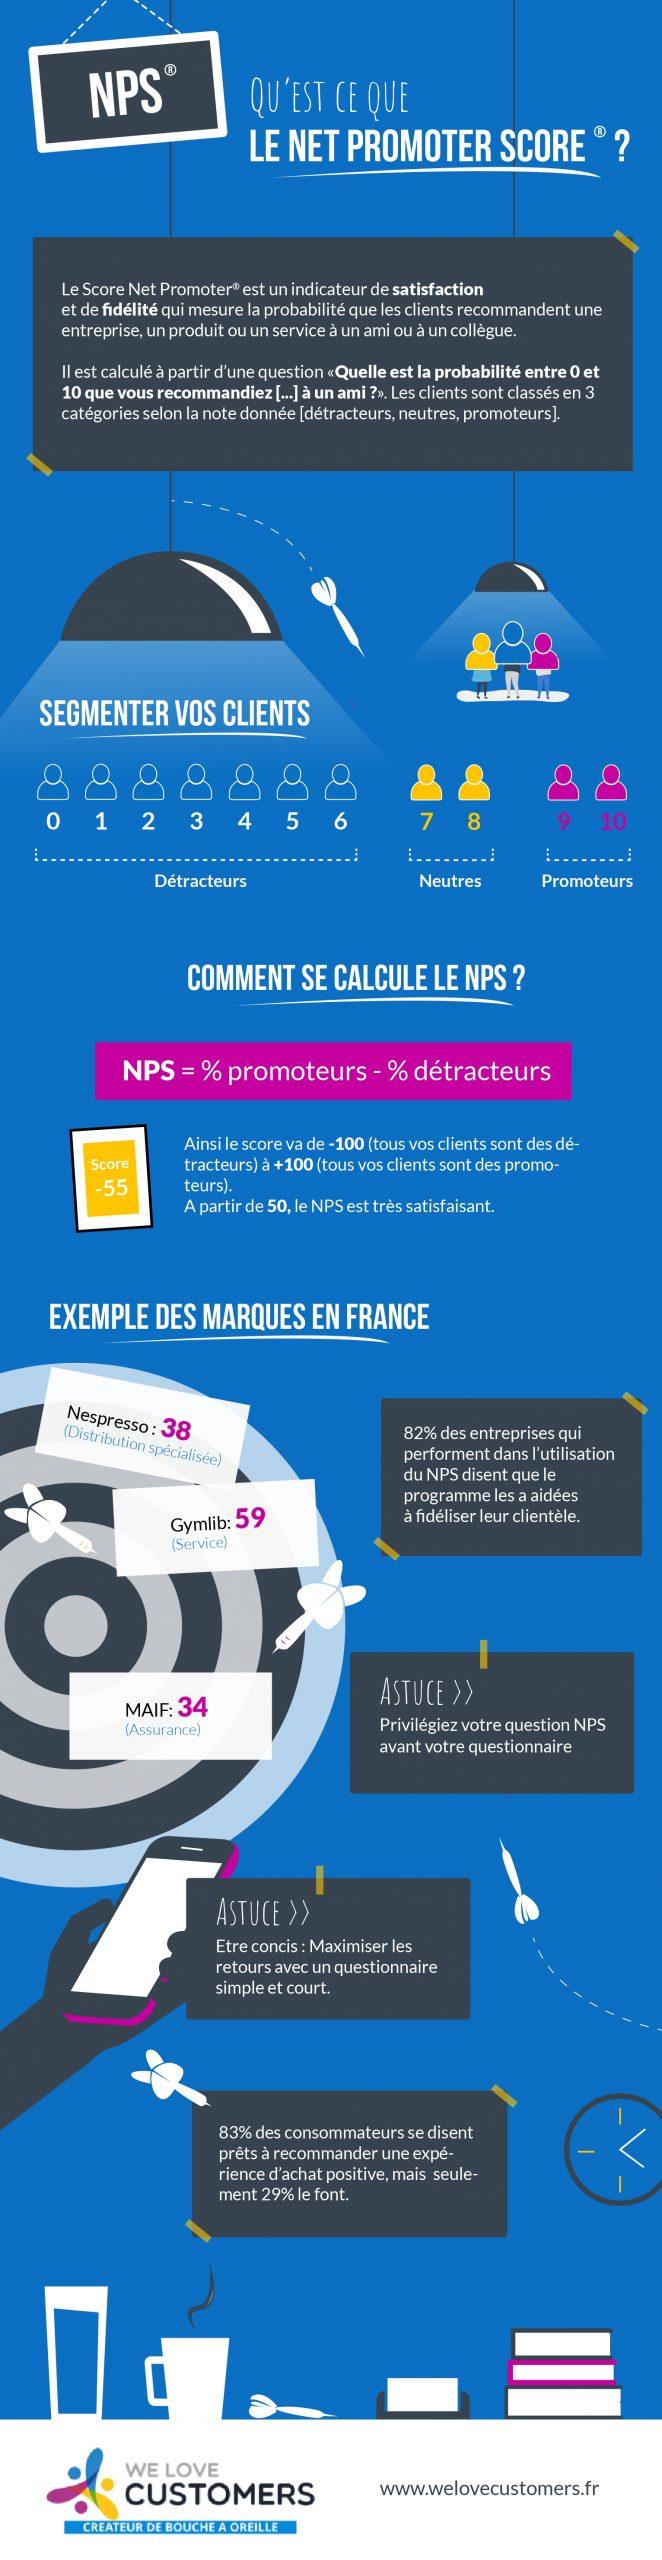 Infographie du NPS